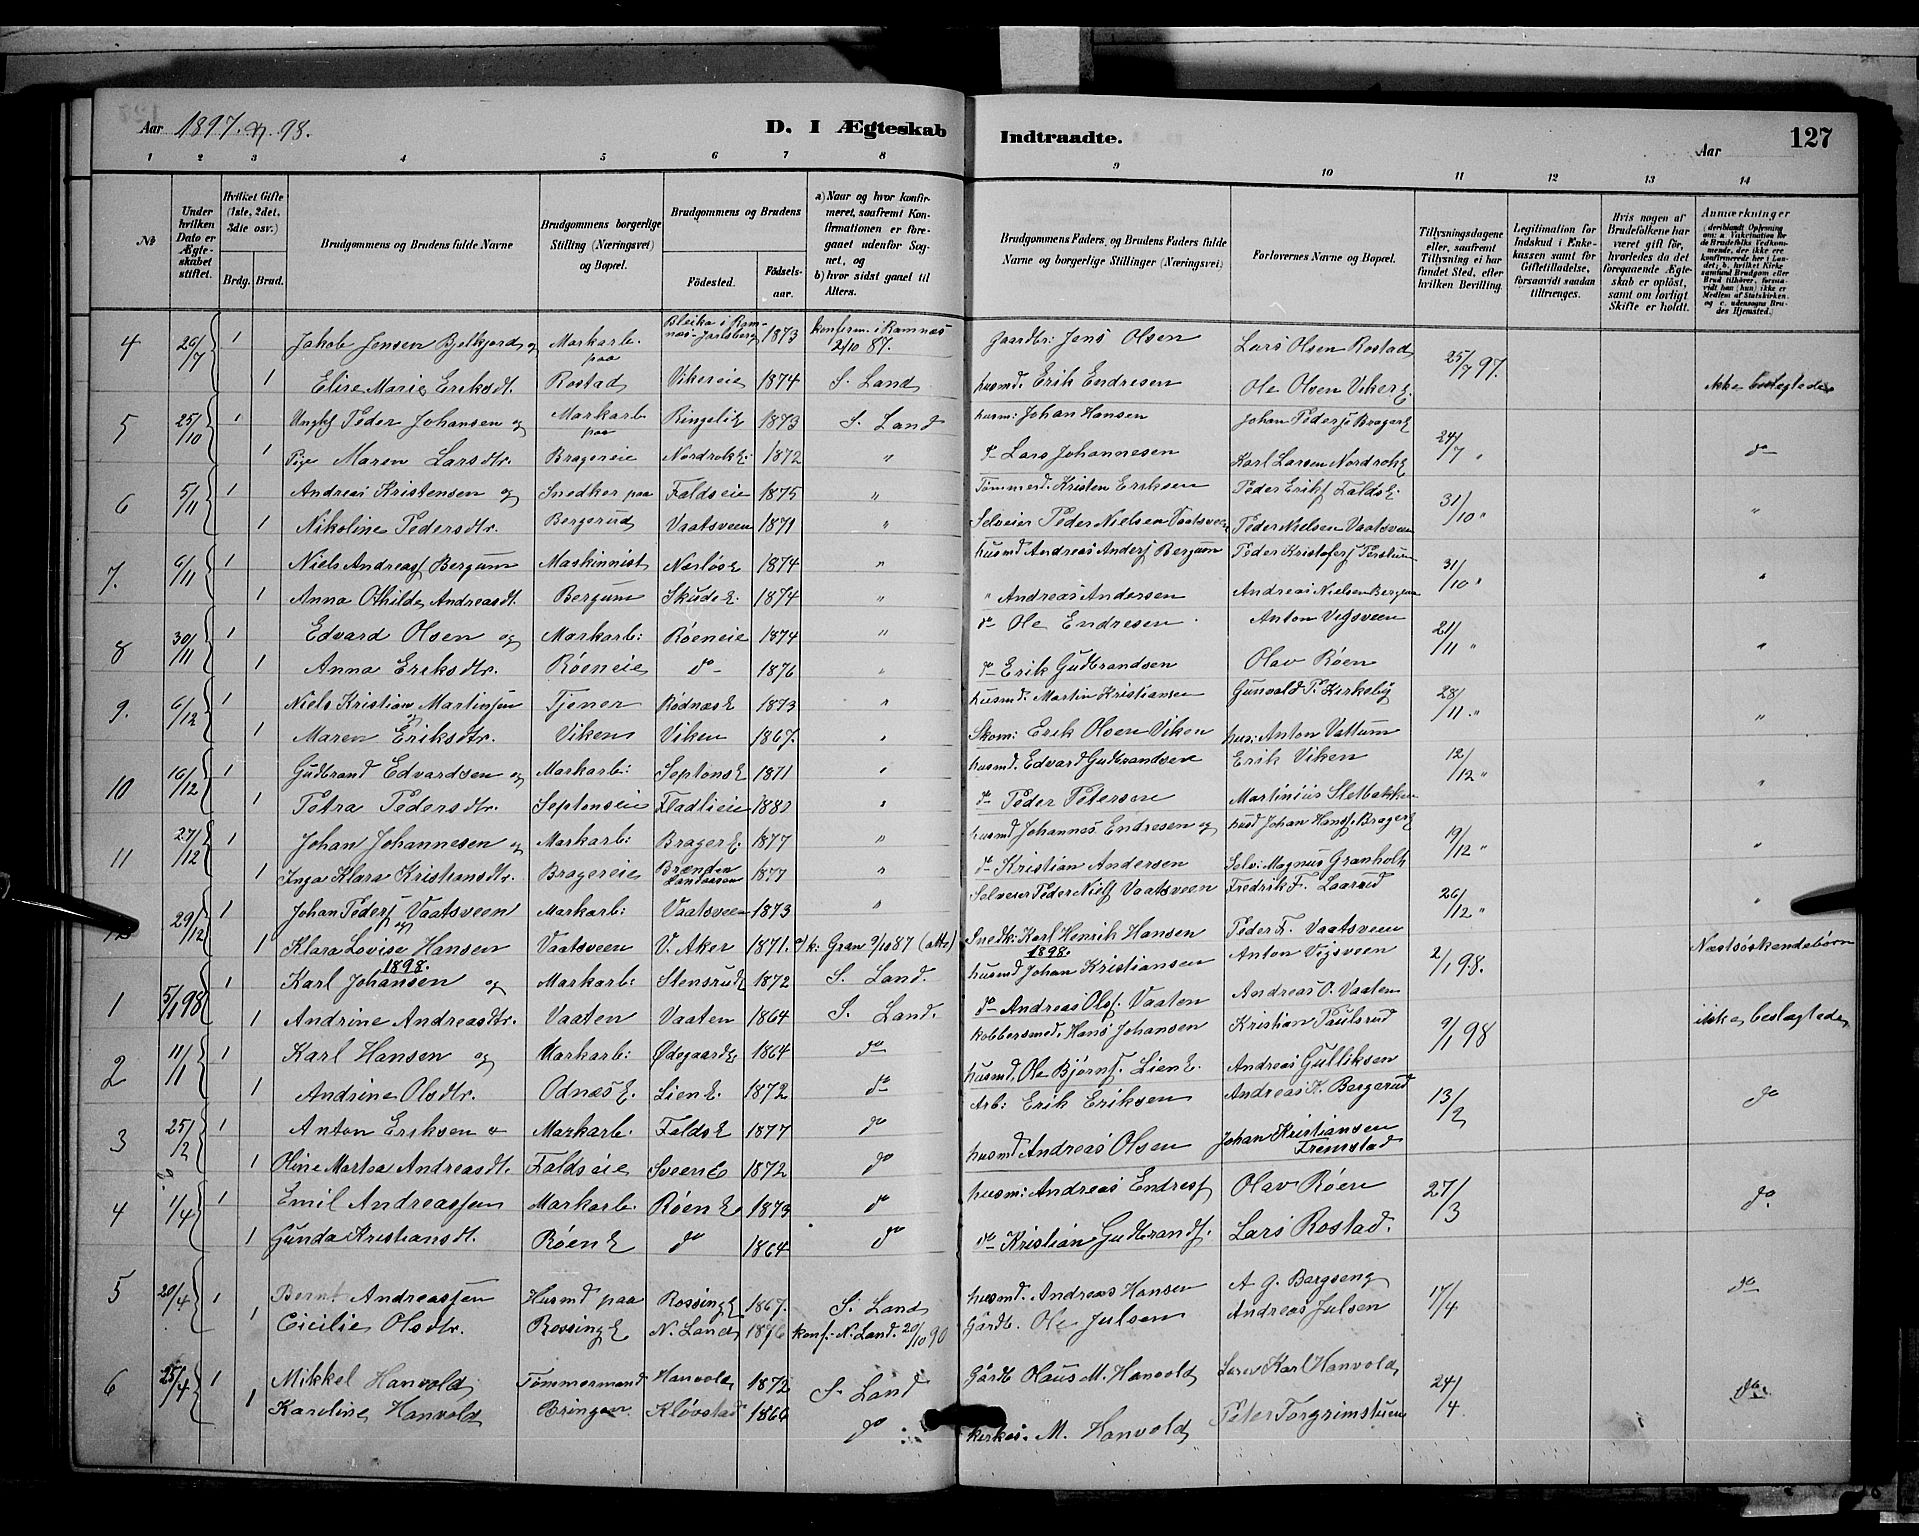 SAH, Søndre Land prestekontor, L/L0003: Klokkerbok nr. 3, 1884-1902, s. 127